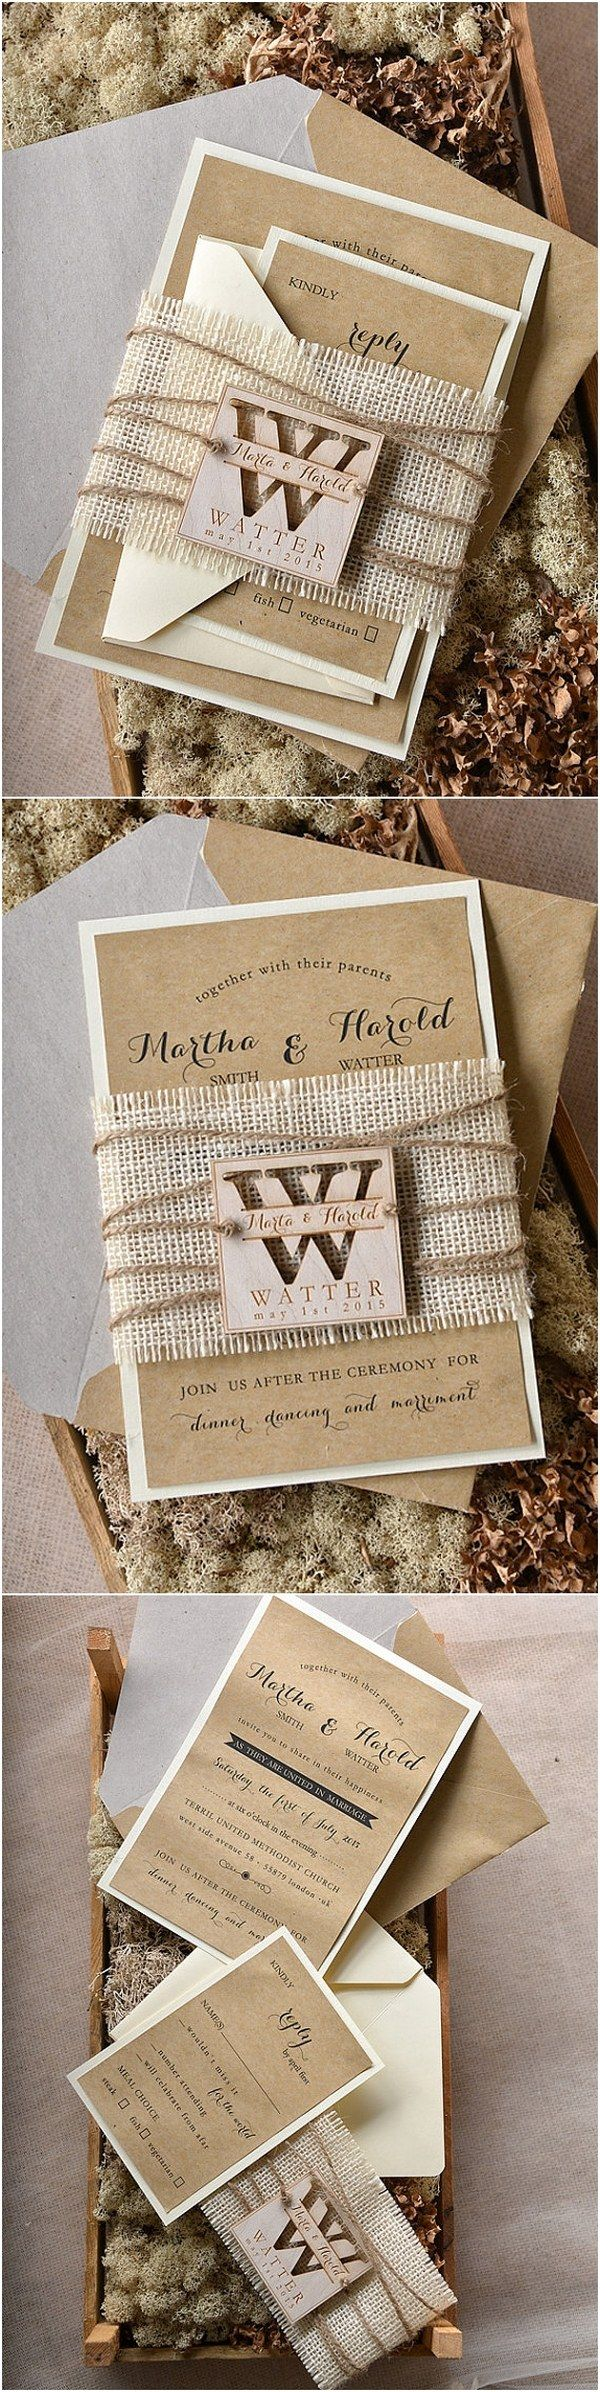 Rustic Country Burlap Wedding Invitations 4LOVEPolkaDots Rusticwedding Countryweding Weddingideas